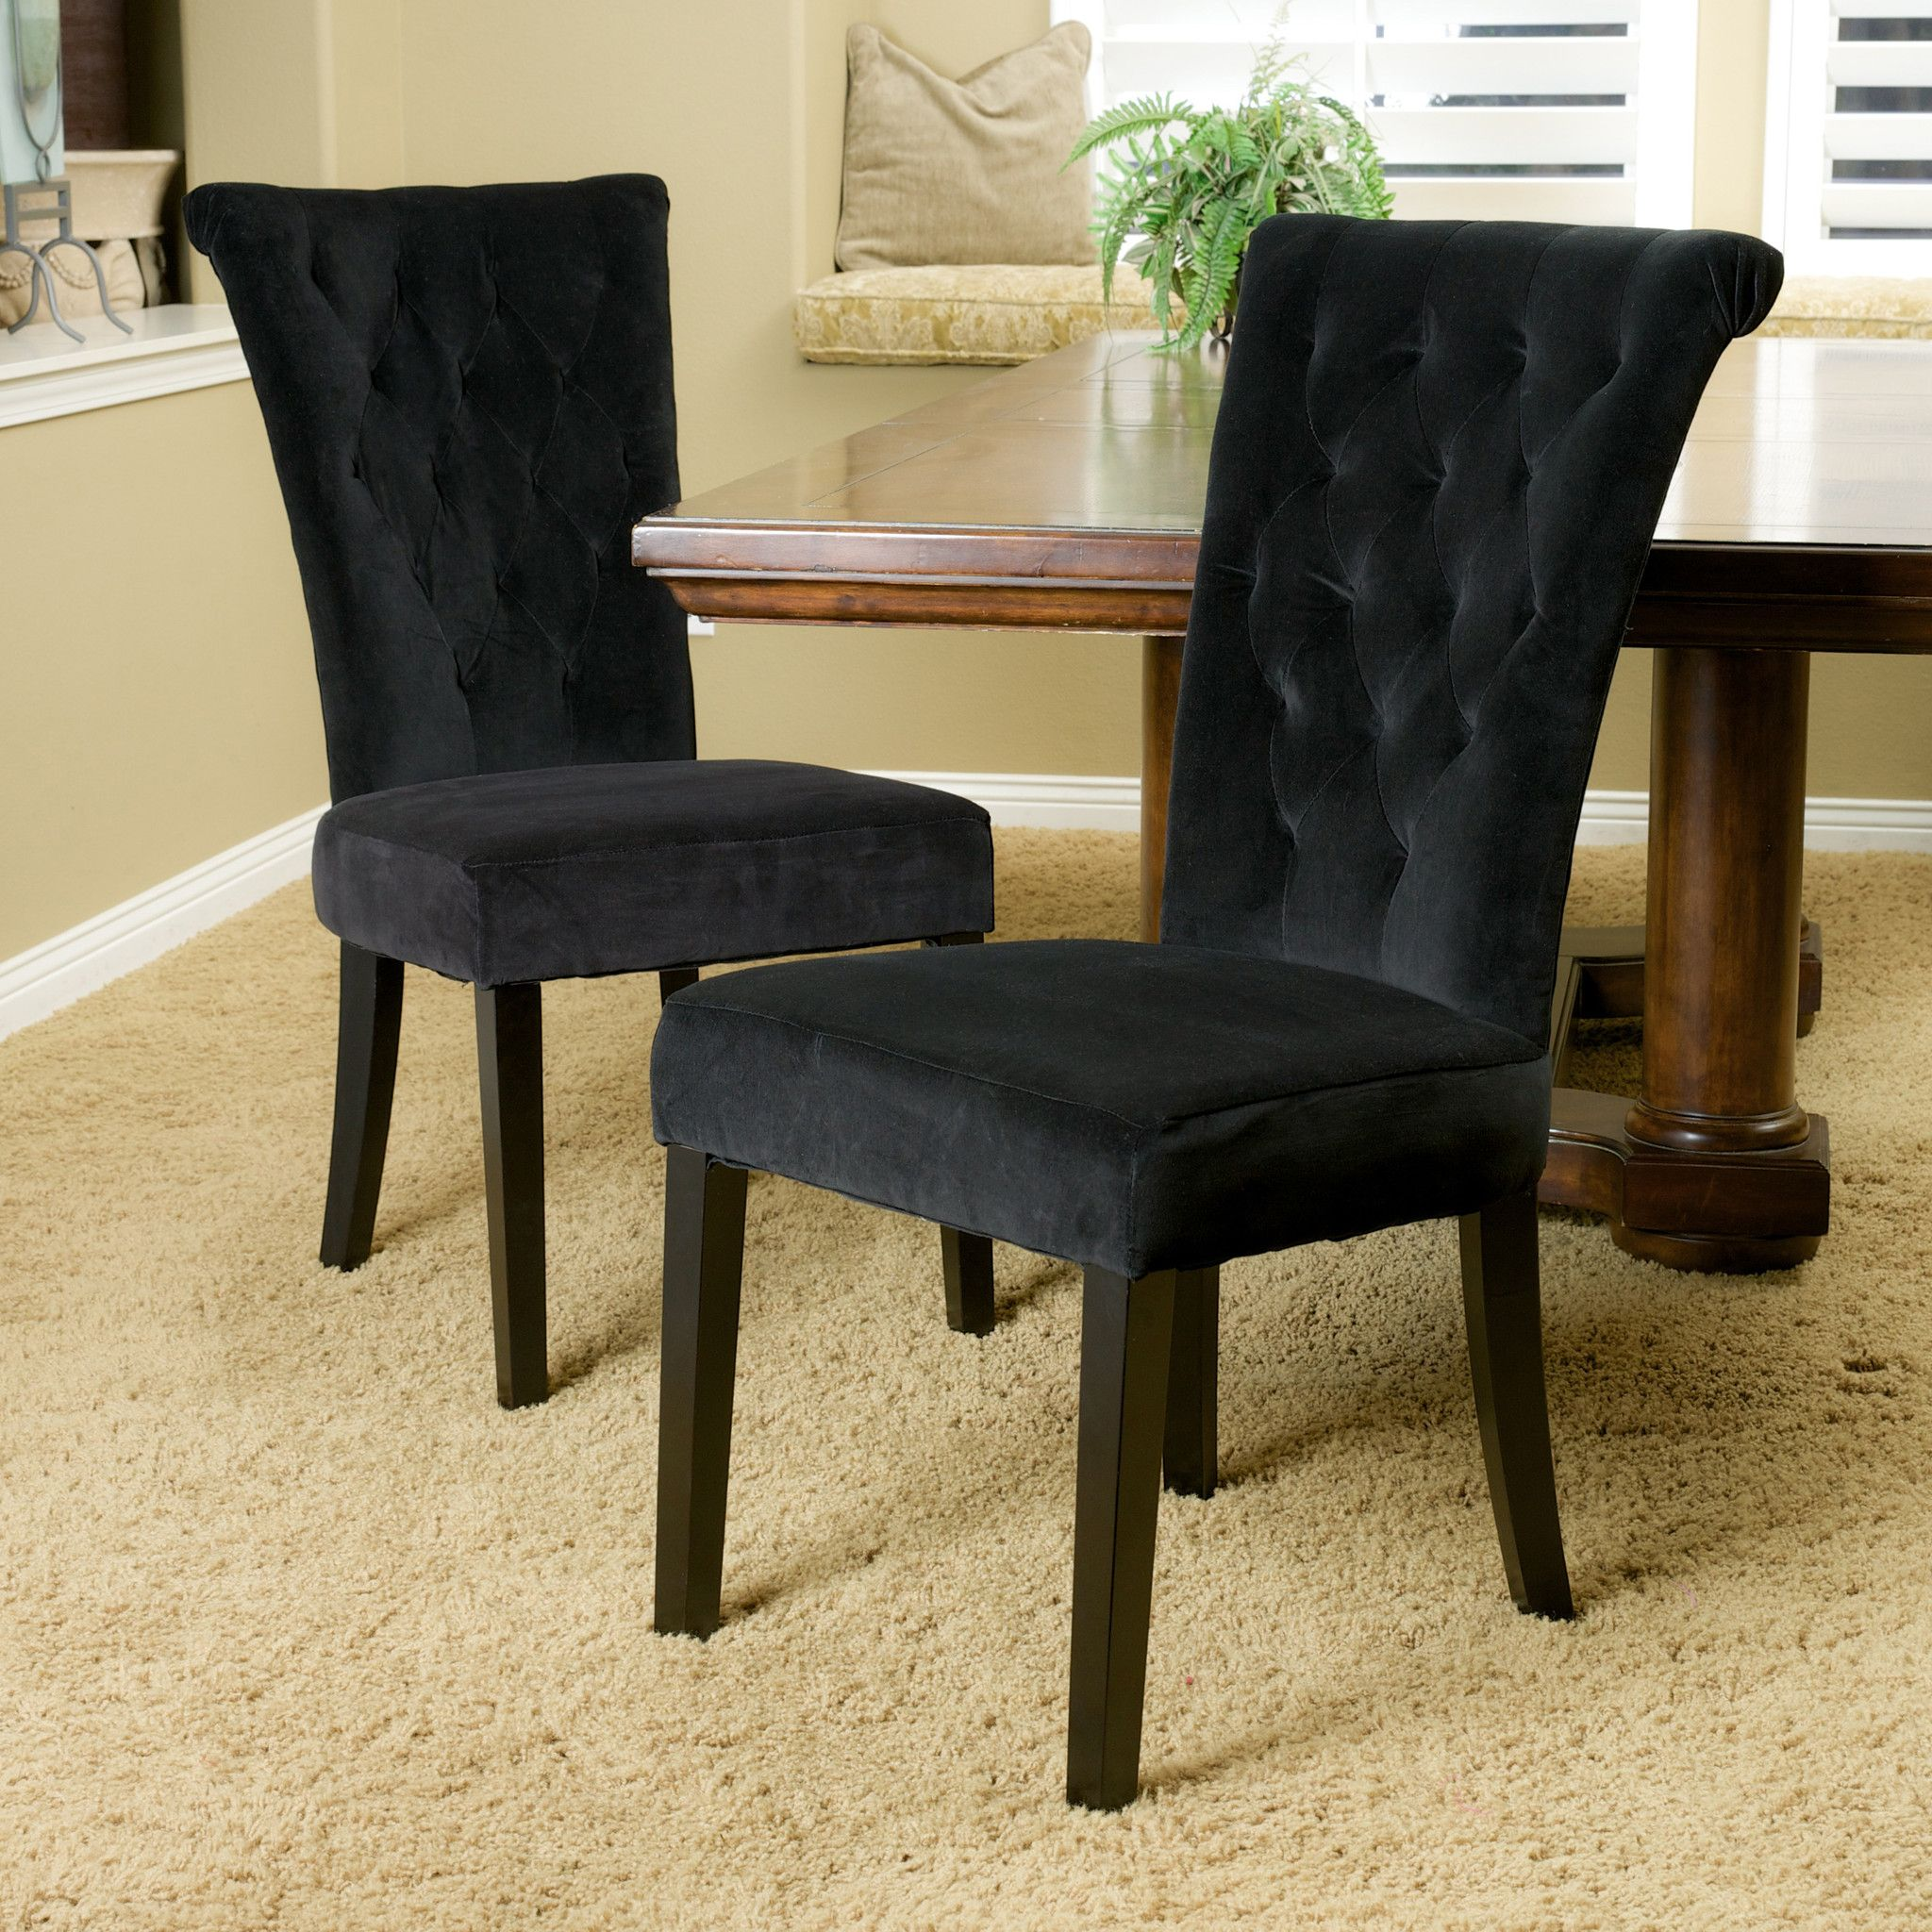 Paulina Black Velvet Dining Chairs Set Of 2 Tufted Dining Chairs Fabric Dining Chairs Parsons Dining Chairs